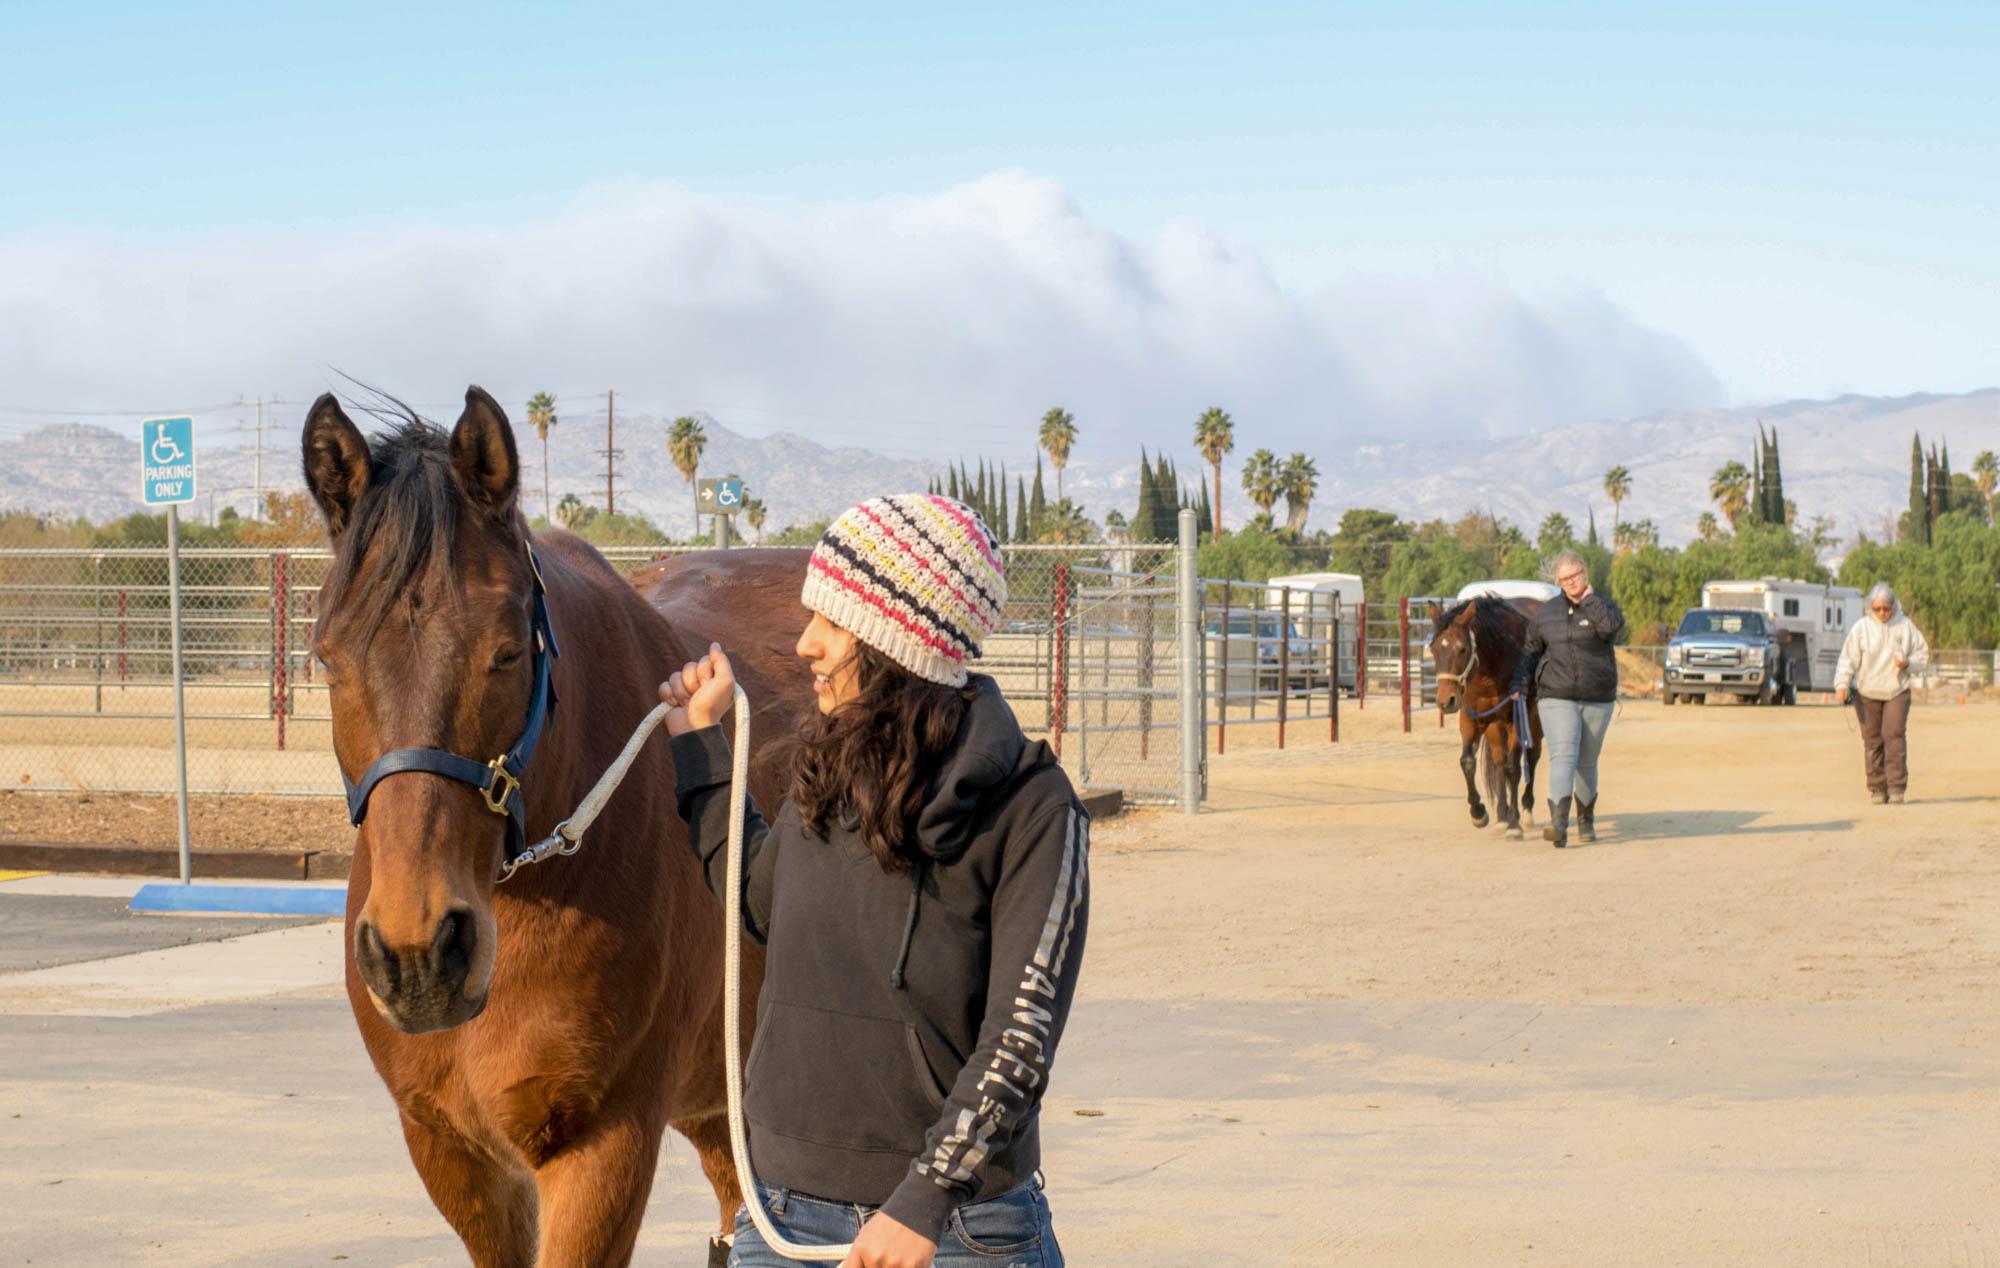 Fire evacuation, animals find stable ground